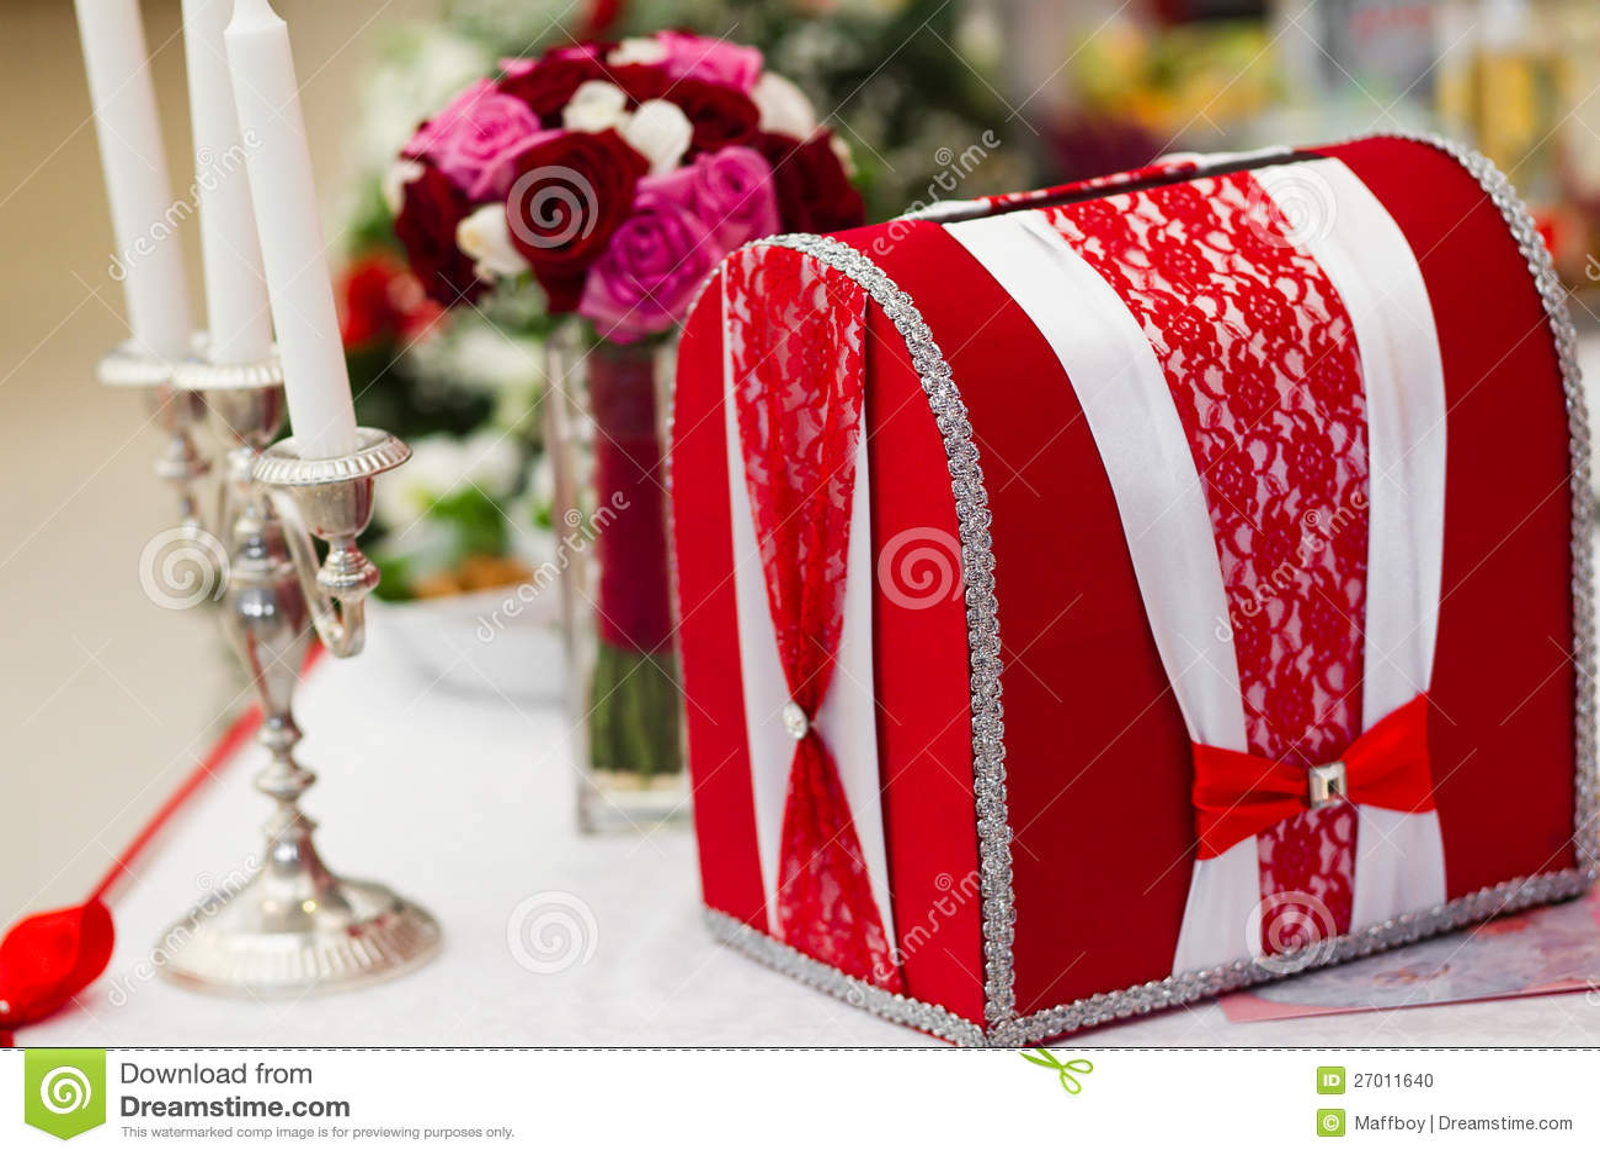 Wedding Card Box Photo Image 27011640 – Red Wedding Card Box